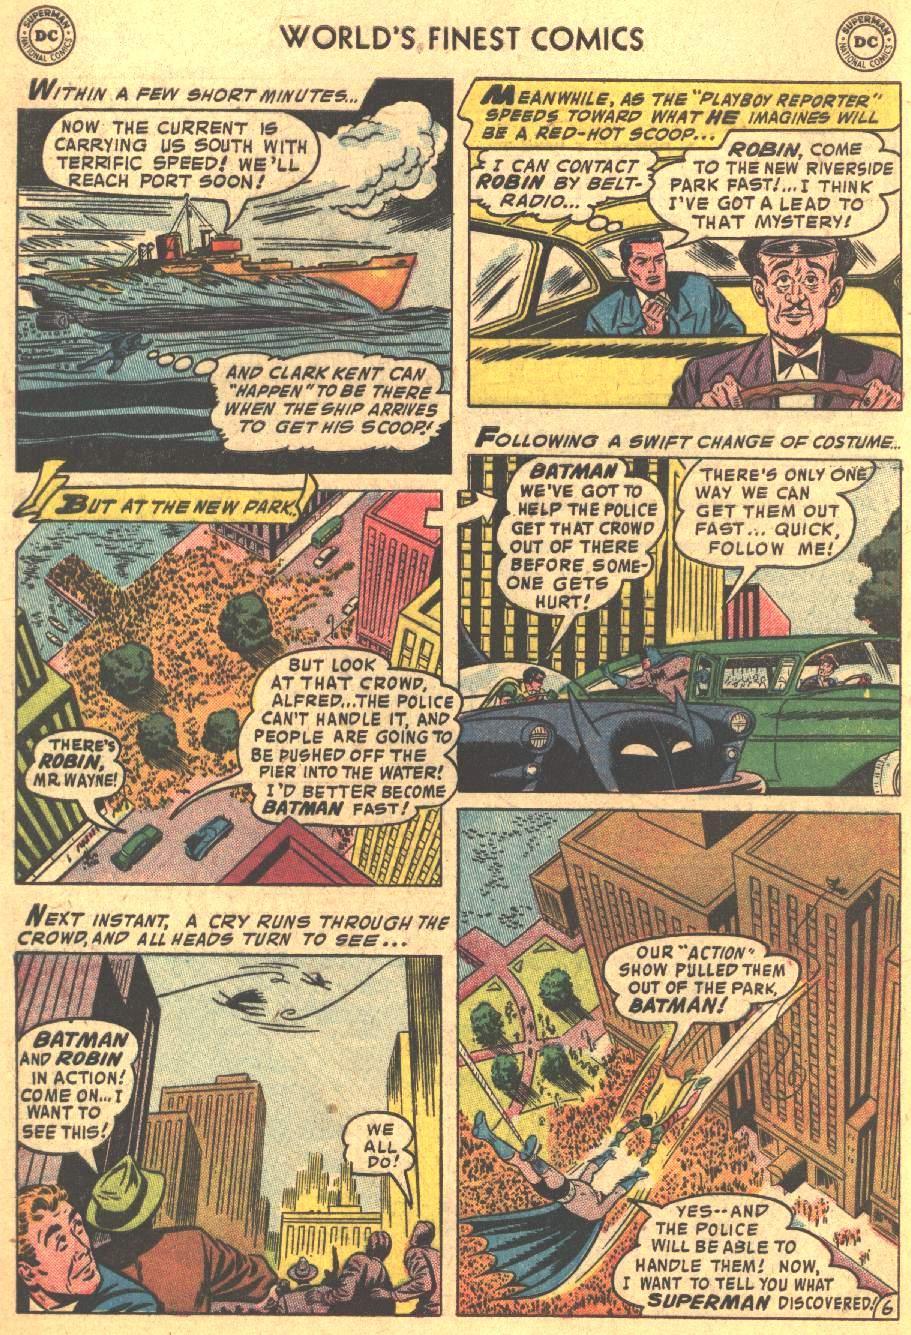 Read online World's Finest Comics comic -  Issue #80 - 8